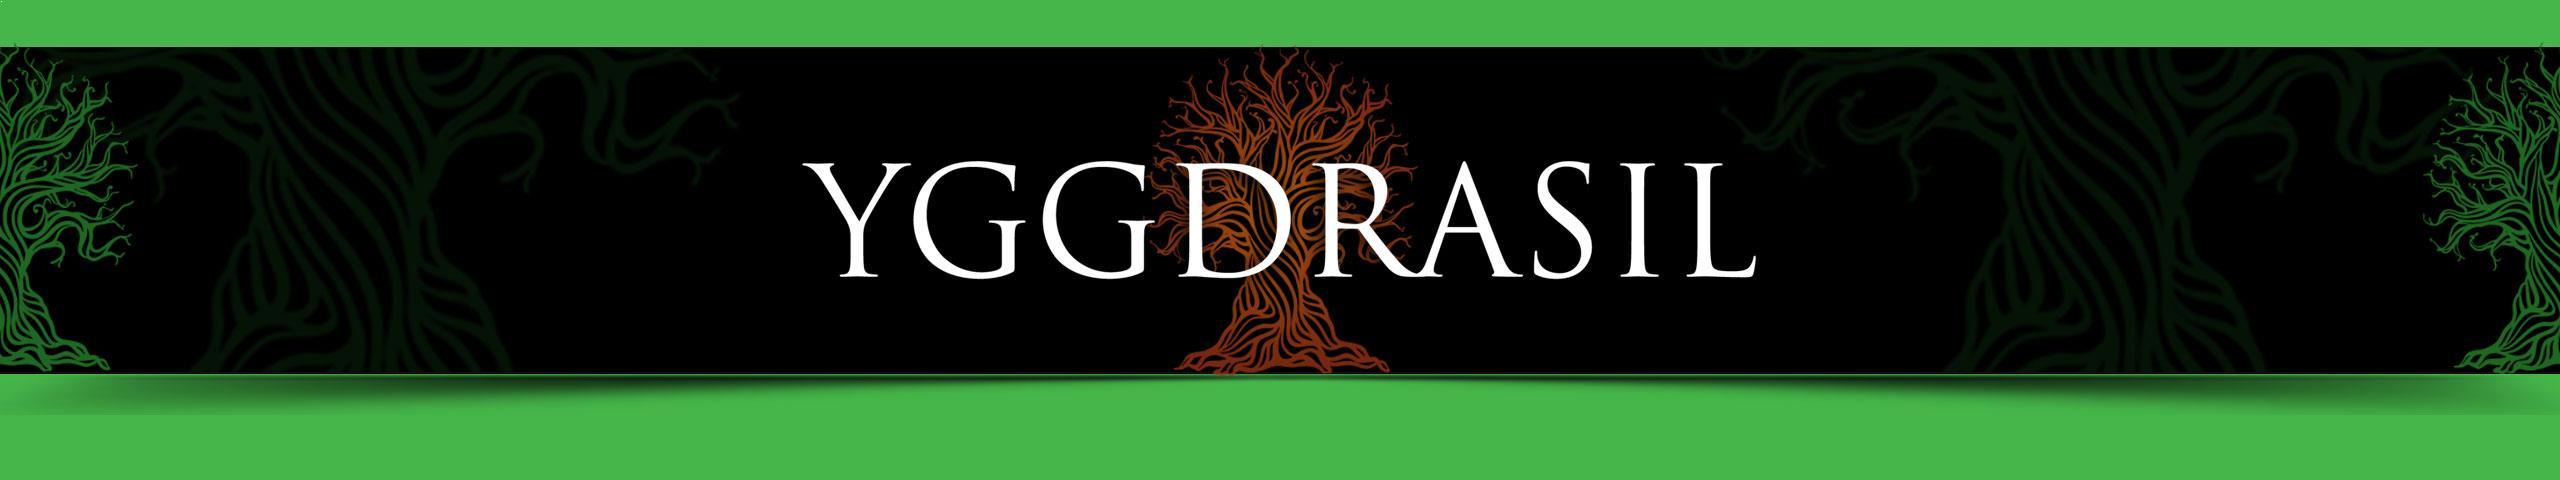 Yggdrasil Gaming - Multabafta.com cazino jocuri developer slider